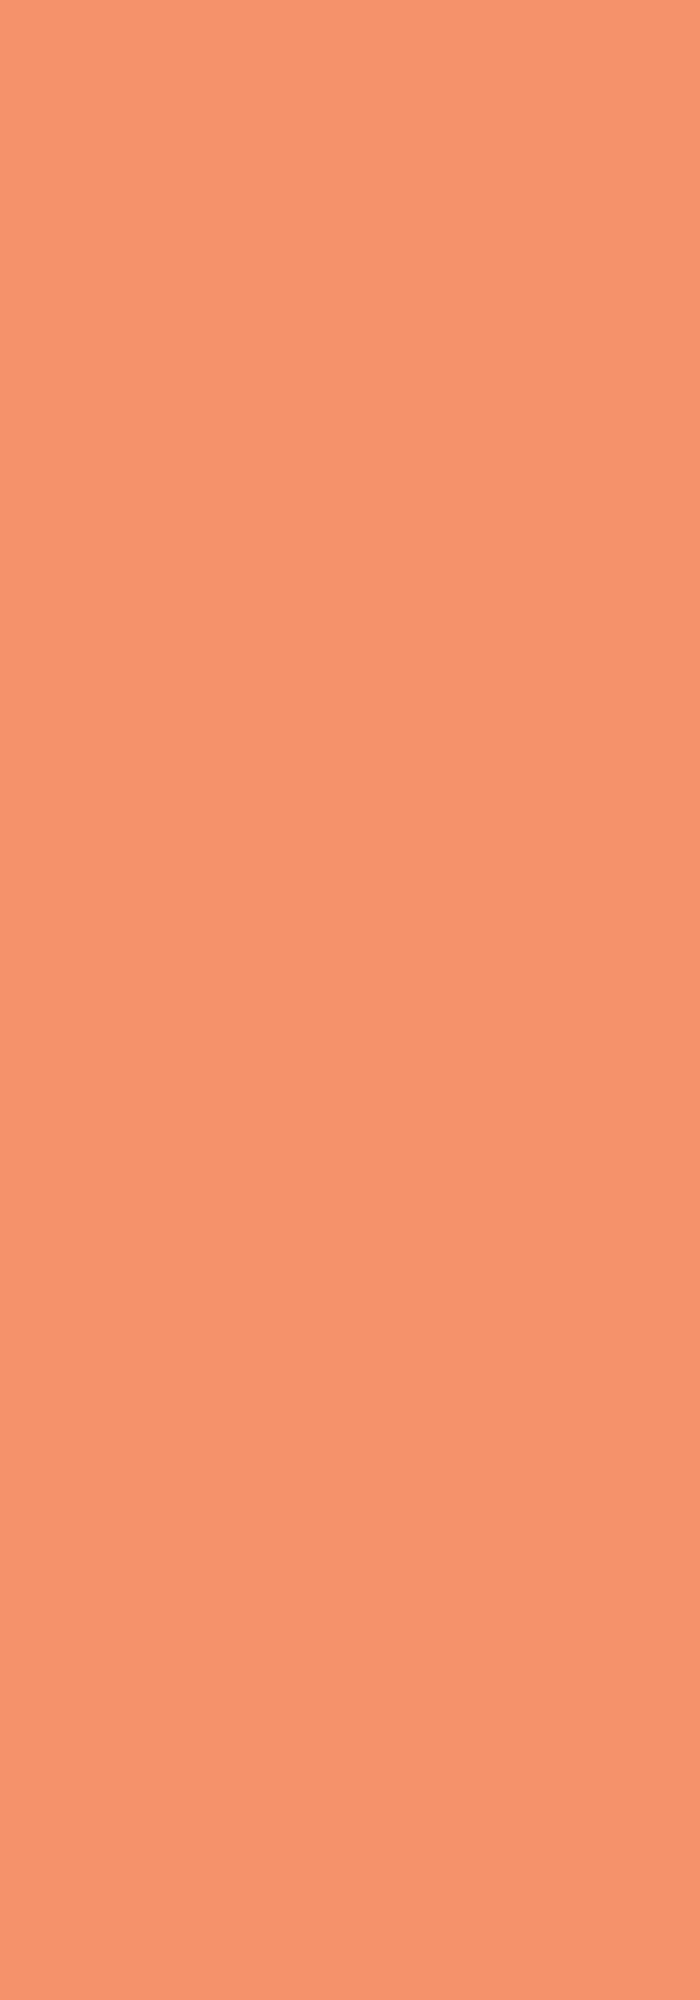 M s de 1000 im genes sobre pantone fall colors 2015 winter - Color pantone 2015 ...